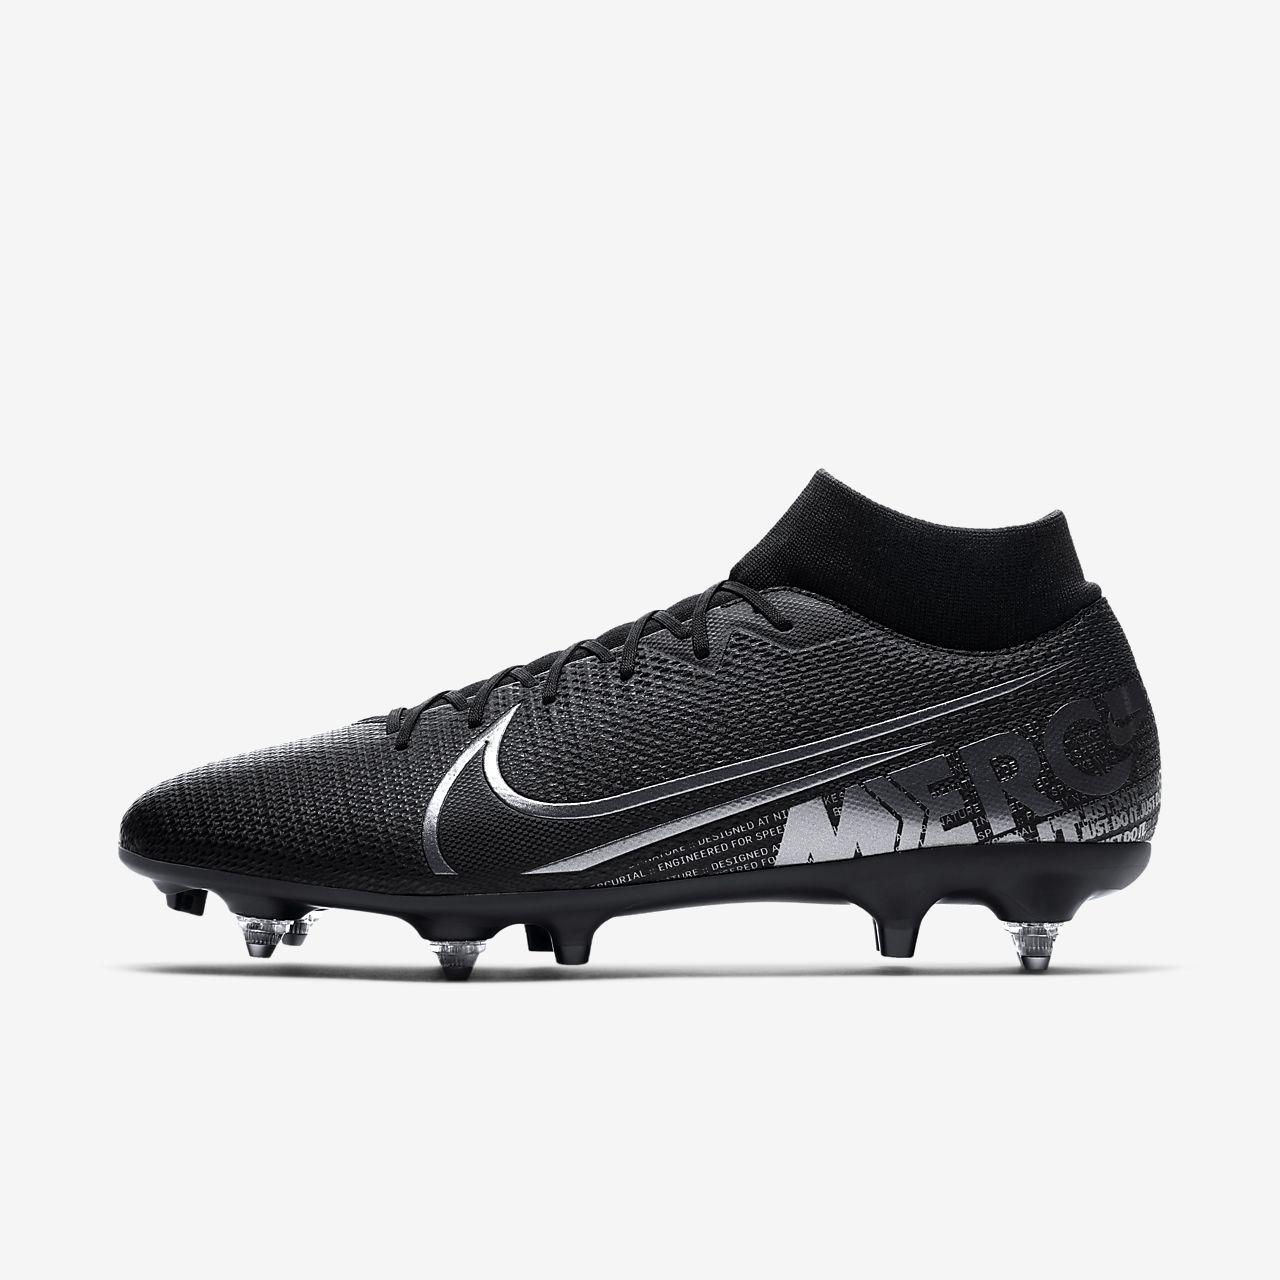 Calzado de fútbol para terreno blando Nike Mercurial Superfly 7 Academy SG-PRO Anti-Clog Traction